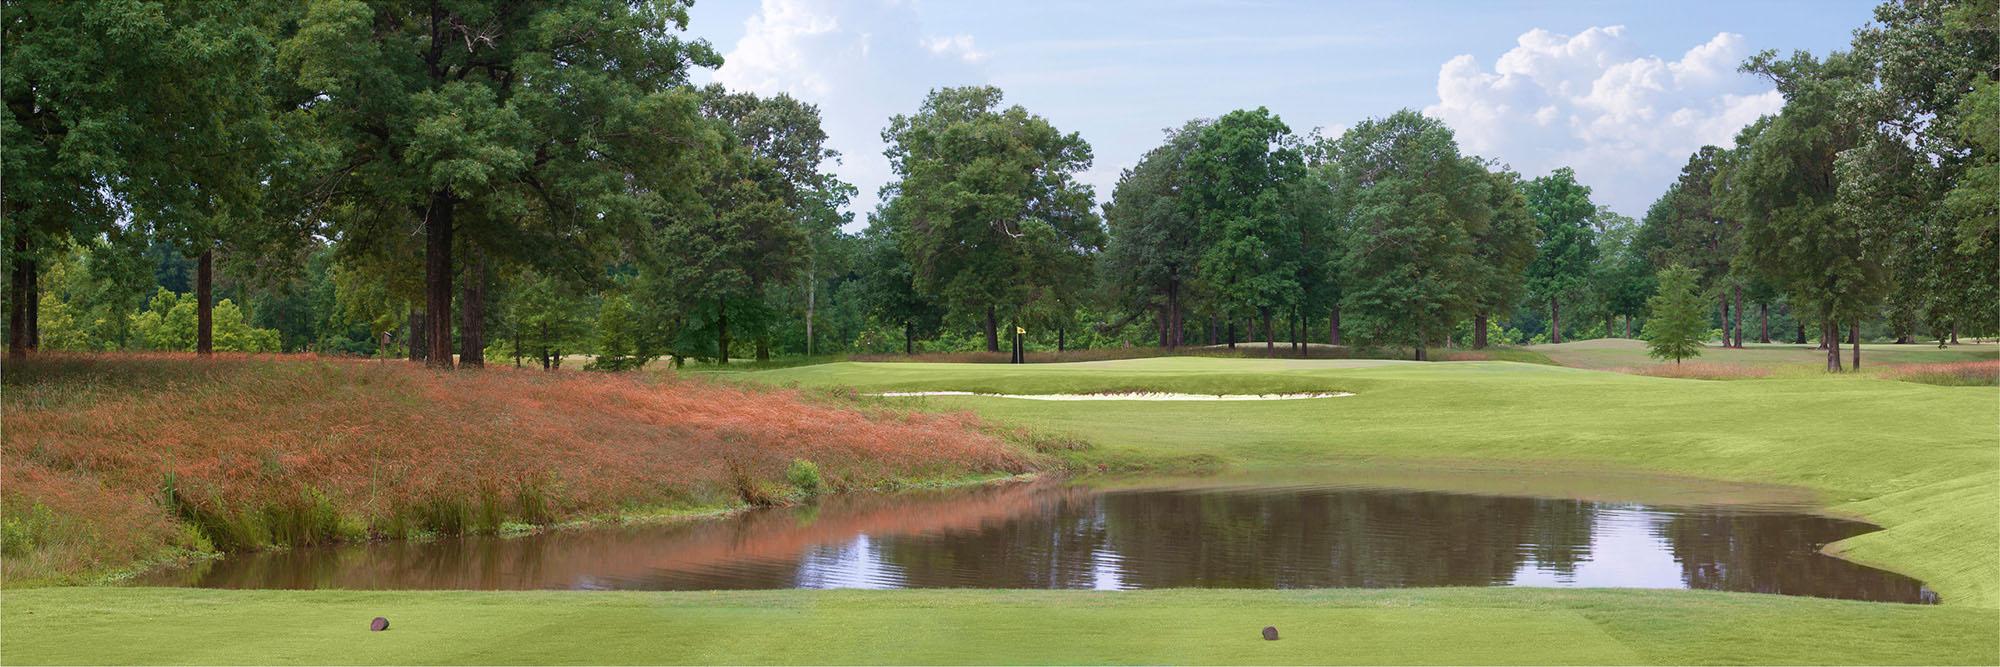 Golf Course Image - Country Club of Jackson No. 7